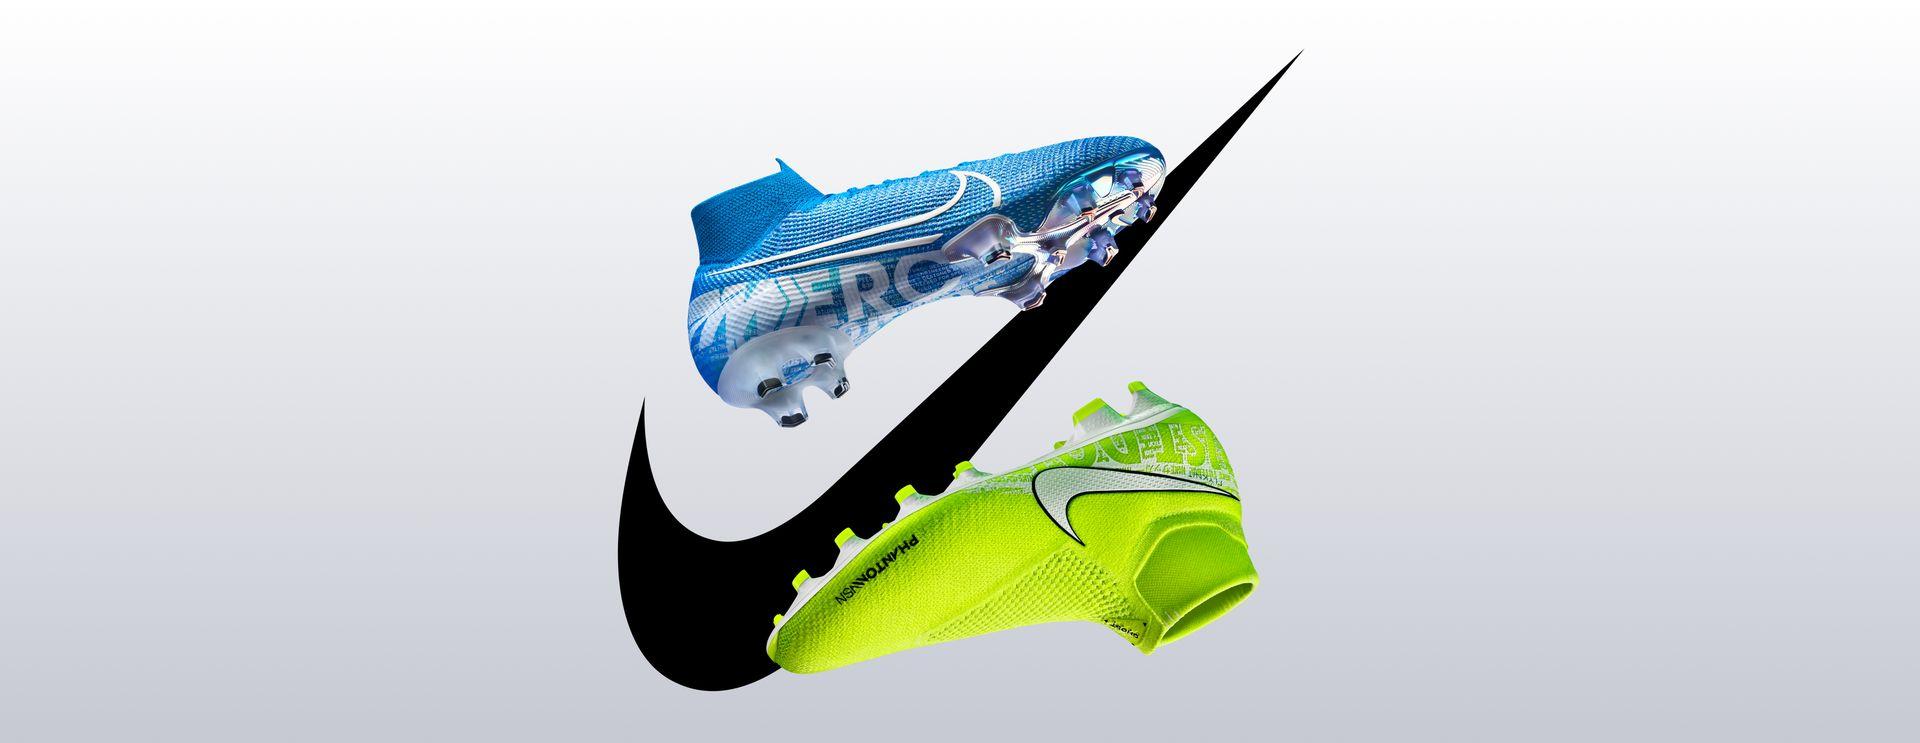 9119ef696 Επίσημος ιστότοπος Nike. Nike.com GR